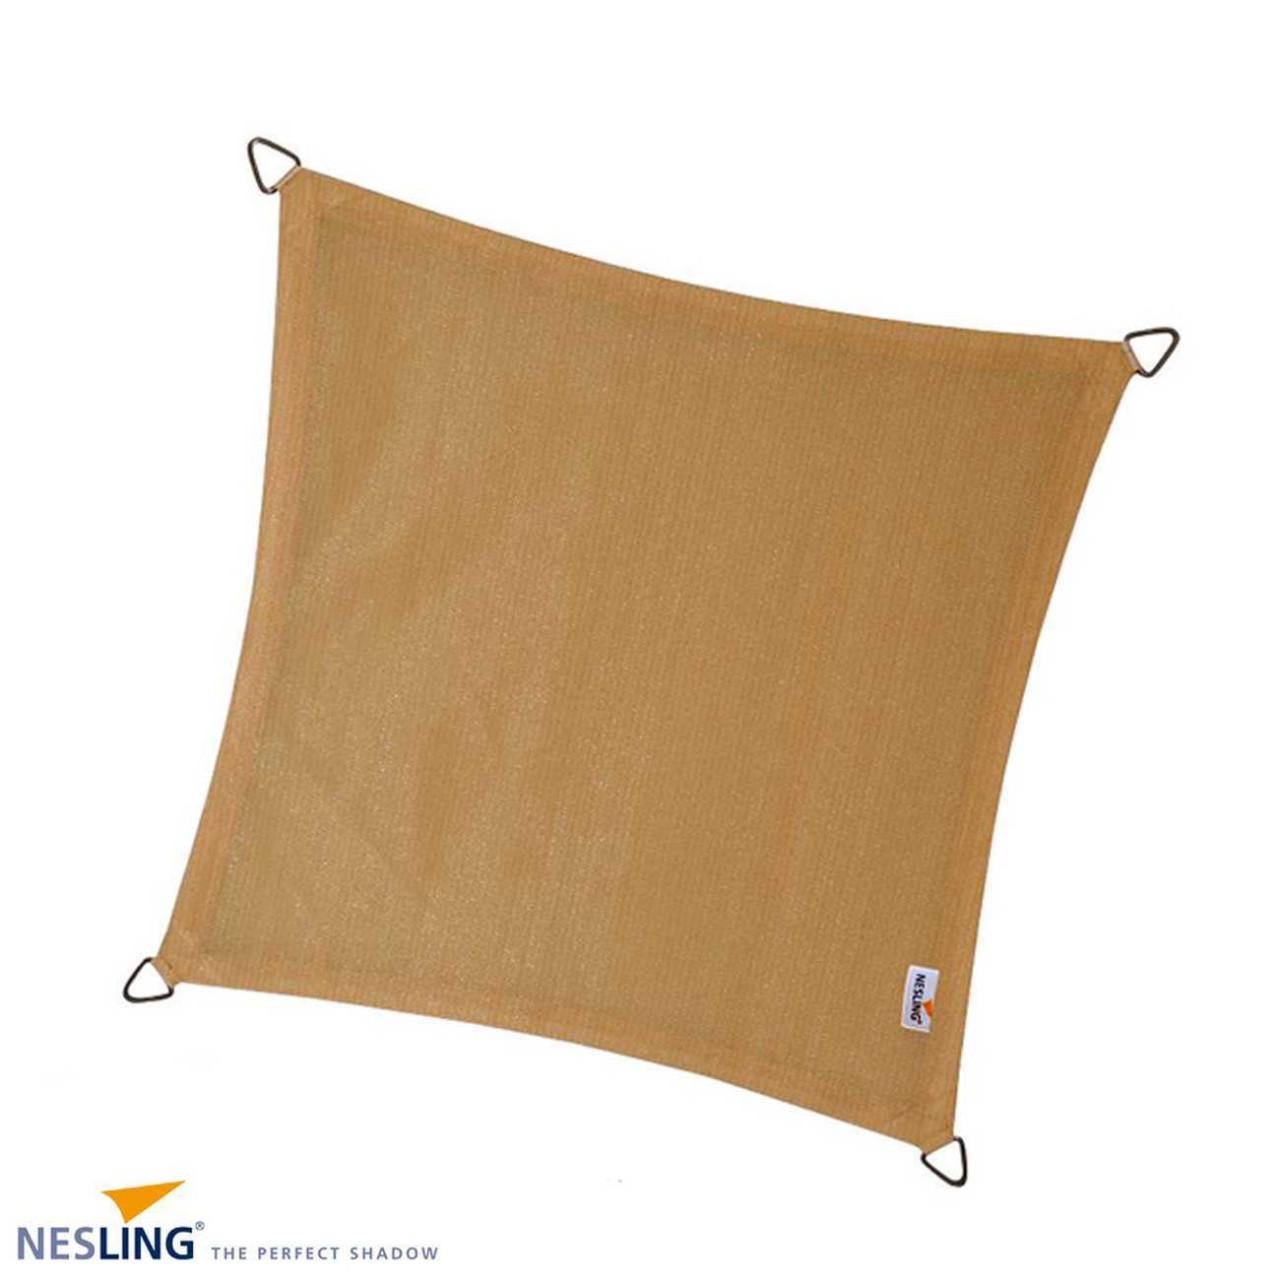 Sonnensegel von Nesling Quadrat 500 x 500 cm